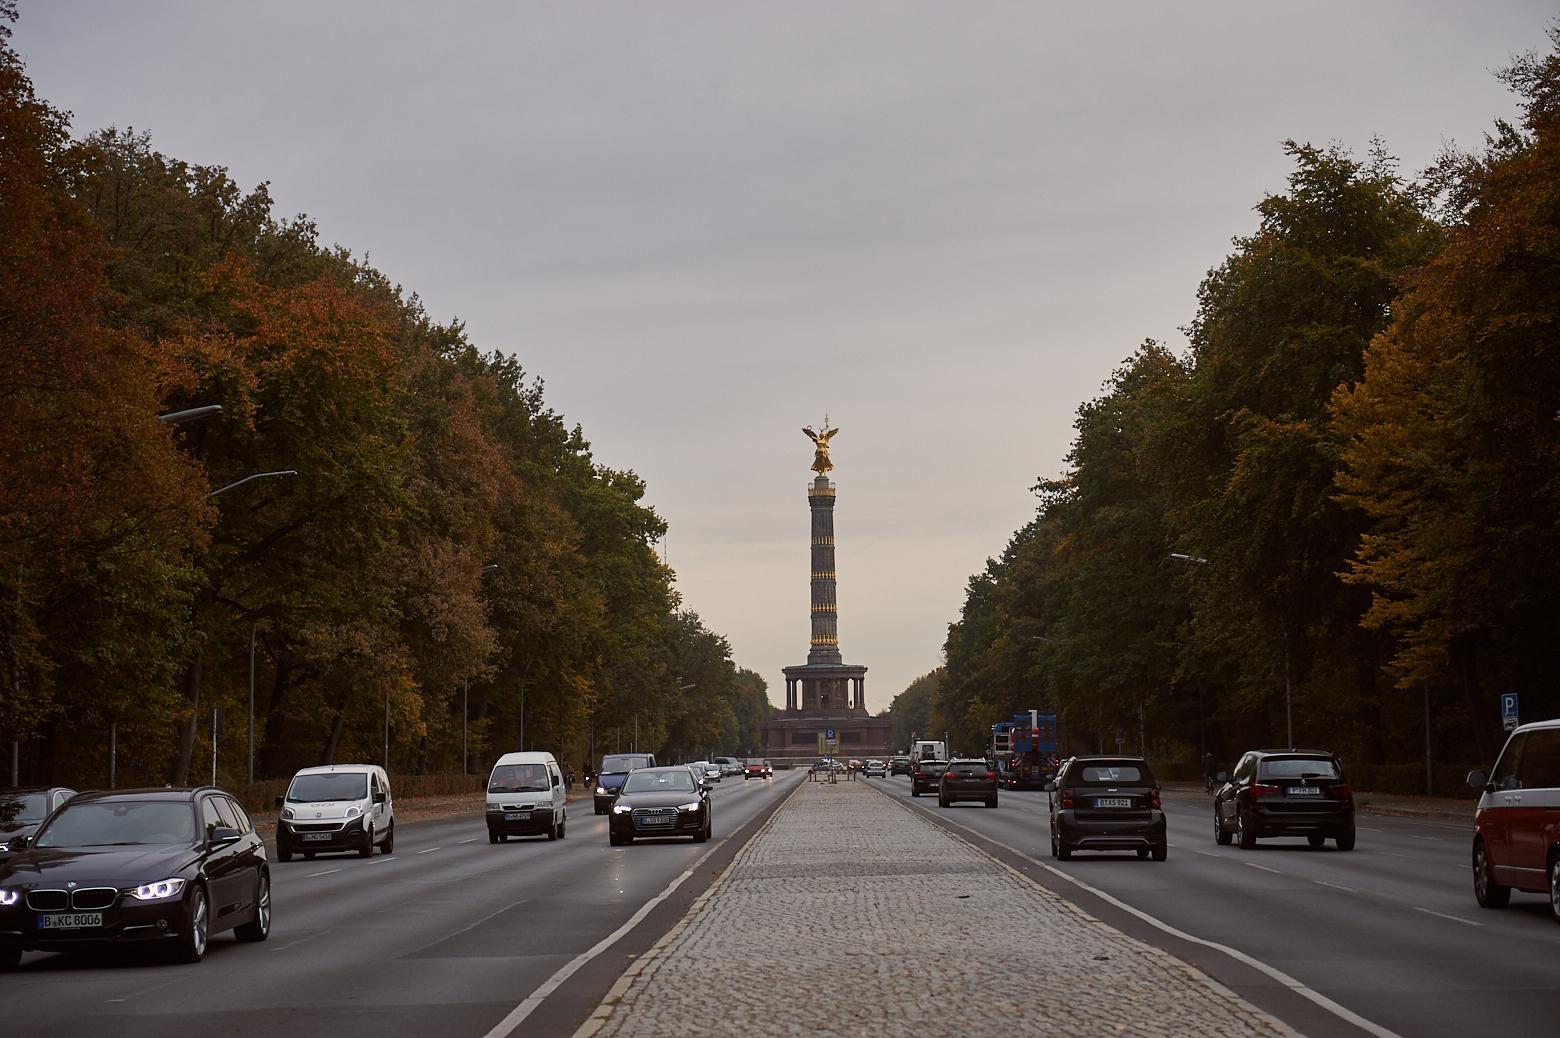 berlin, germany, travel, autumn, rain, city, photos and the city